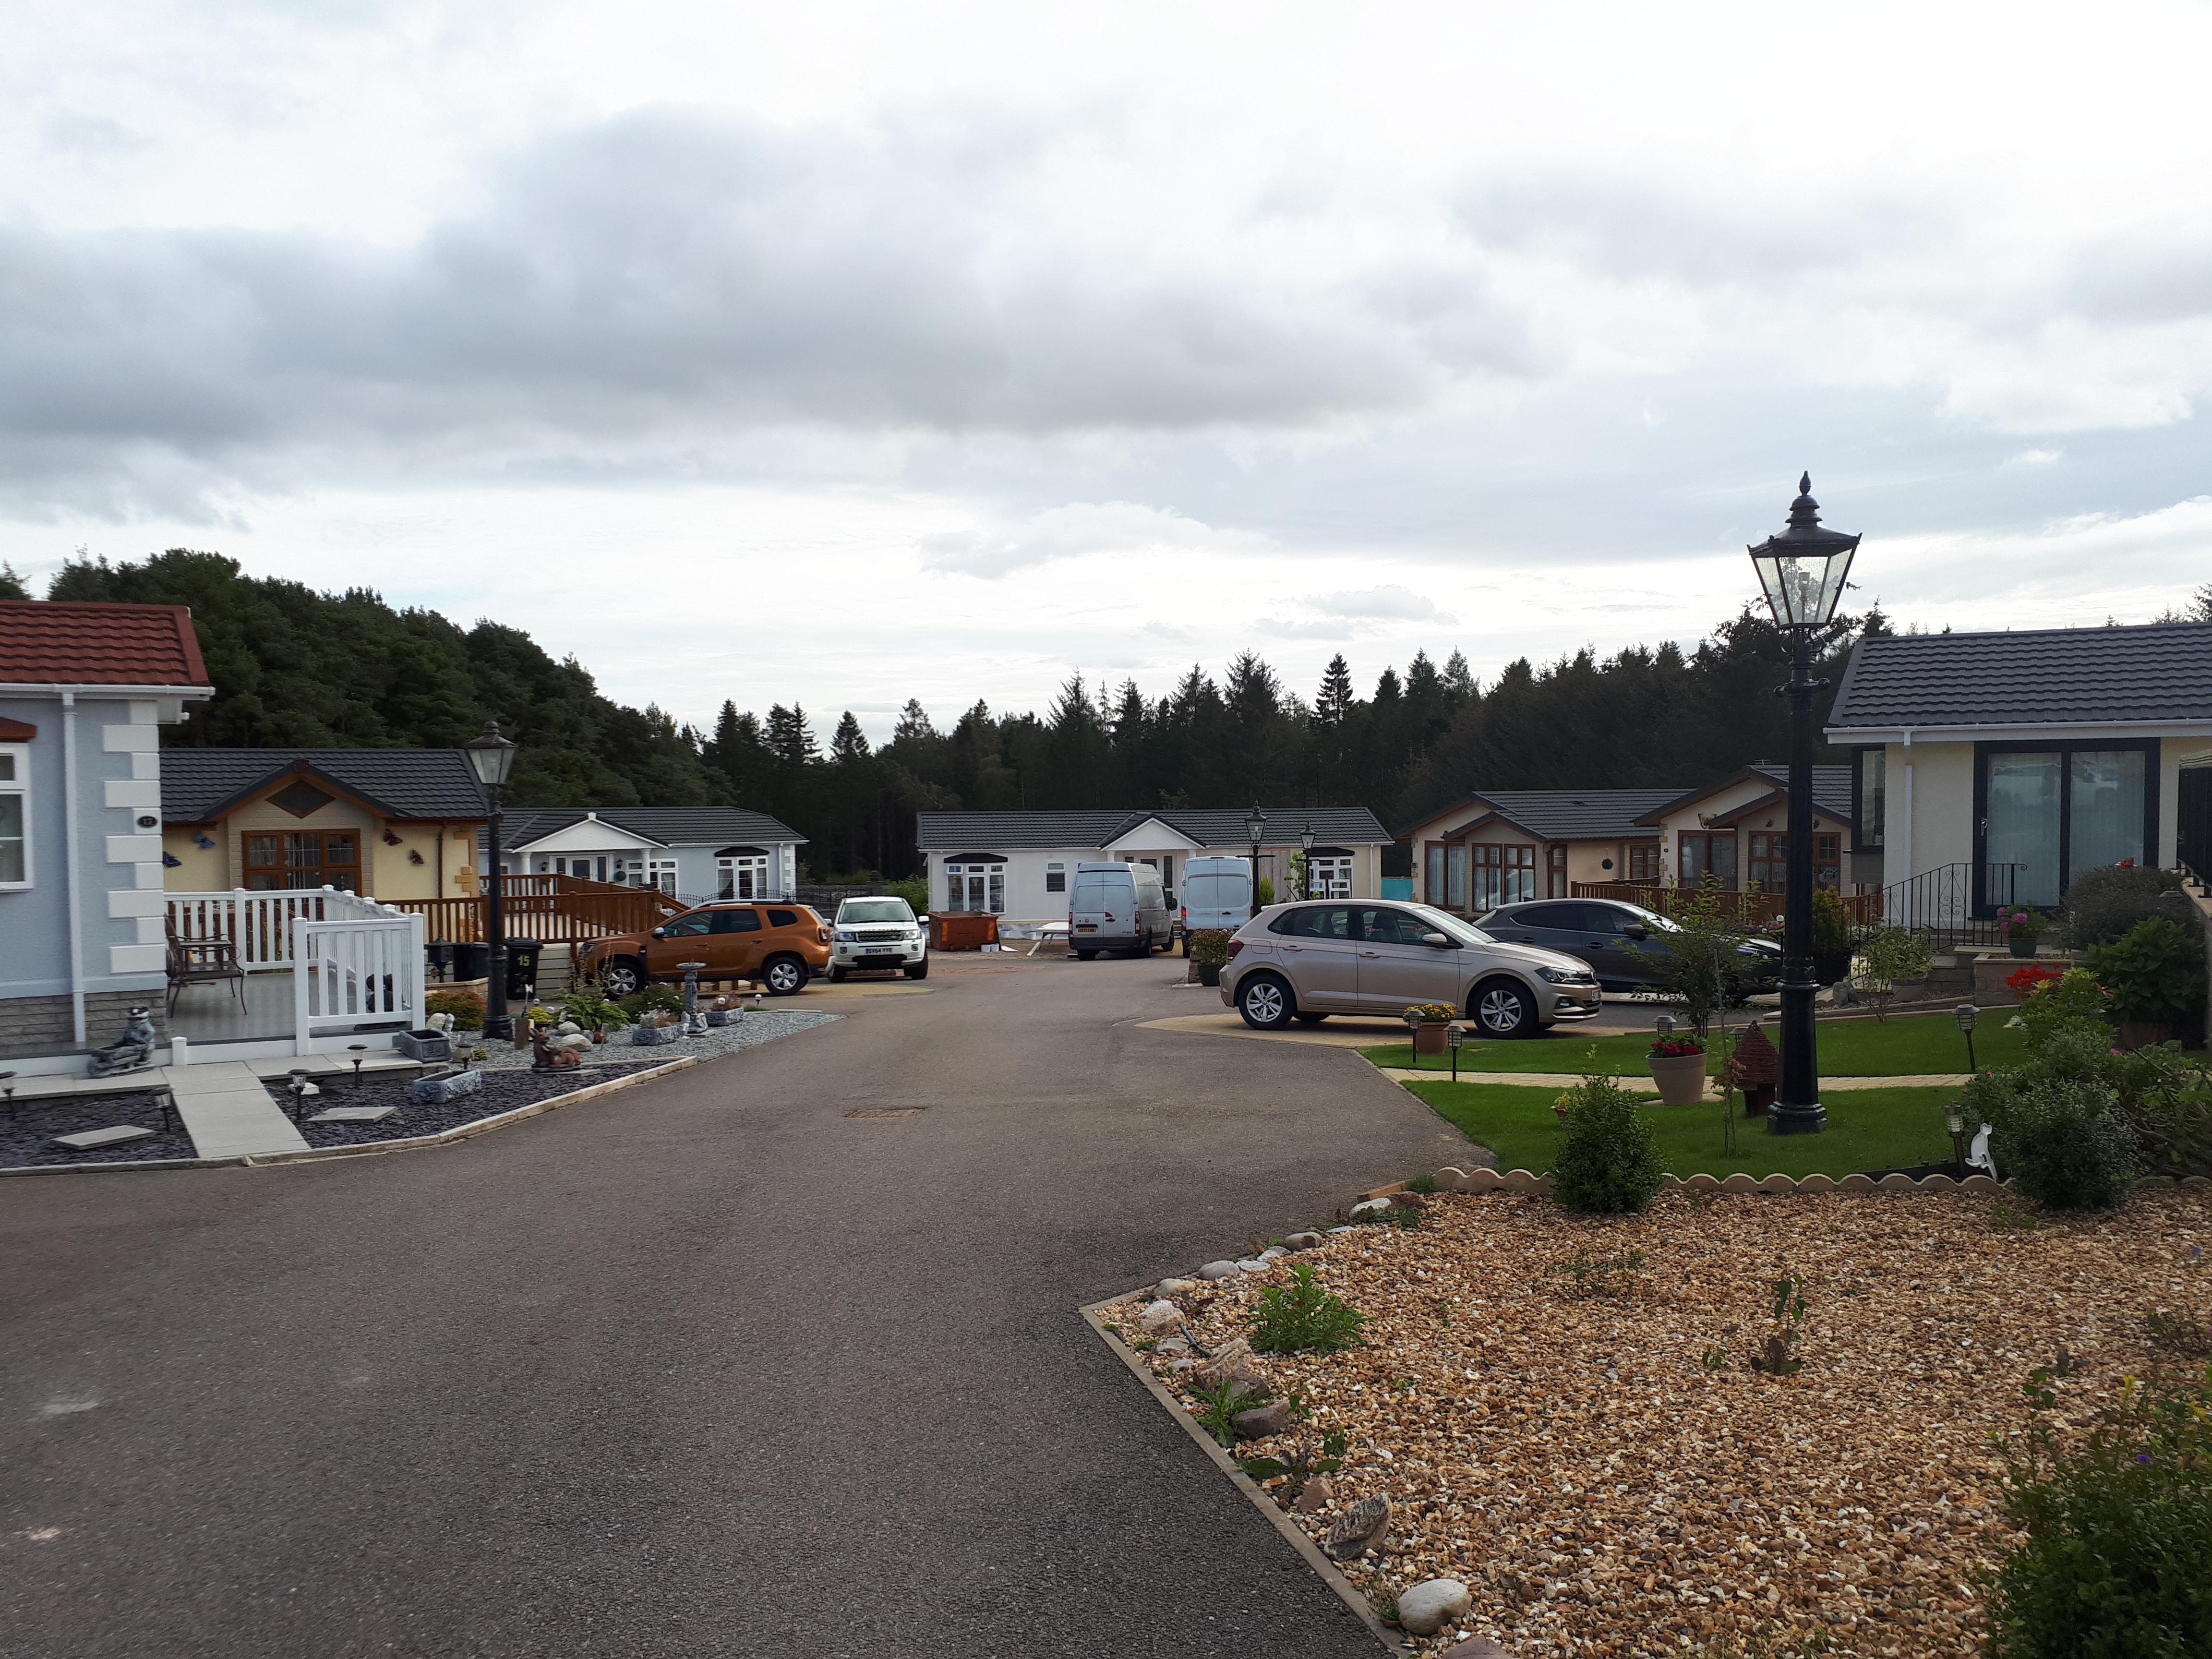 Pensioners who live at Aberdeenshire caravan park face uncertain future